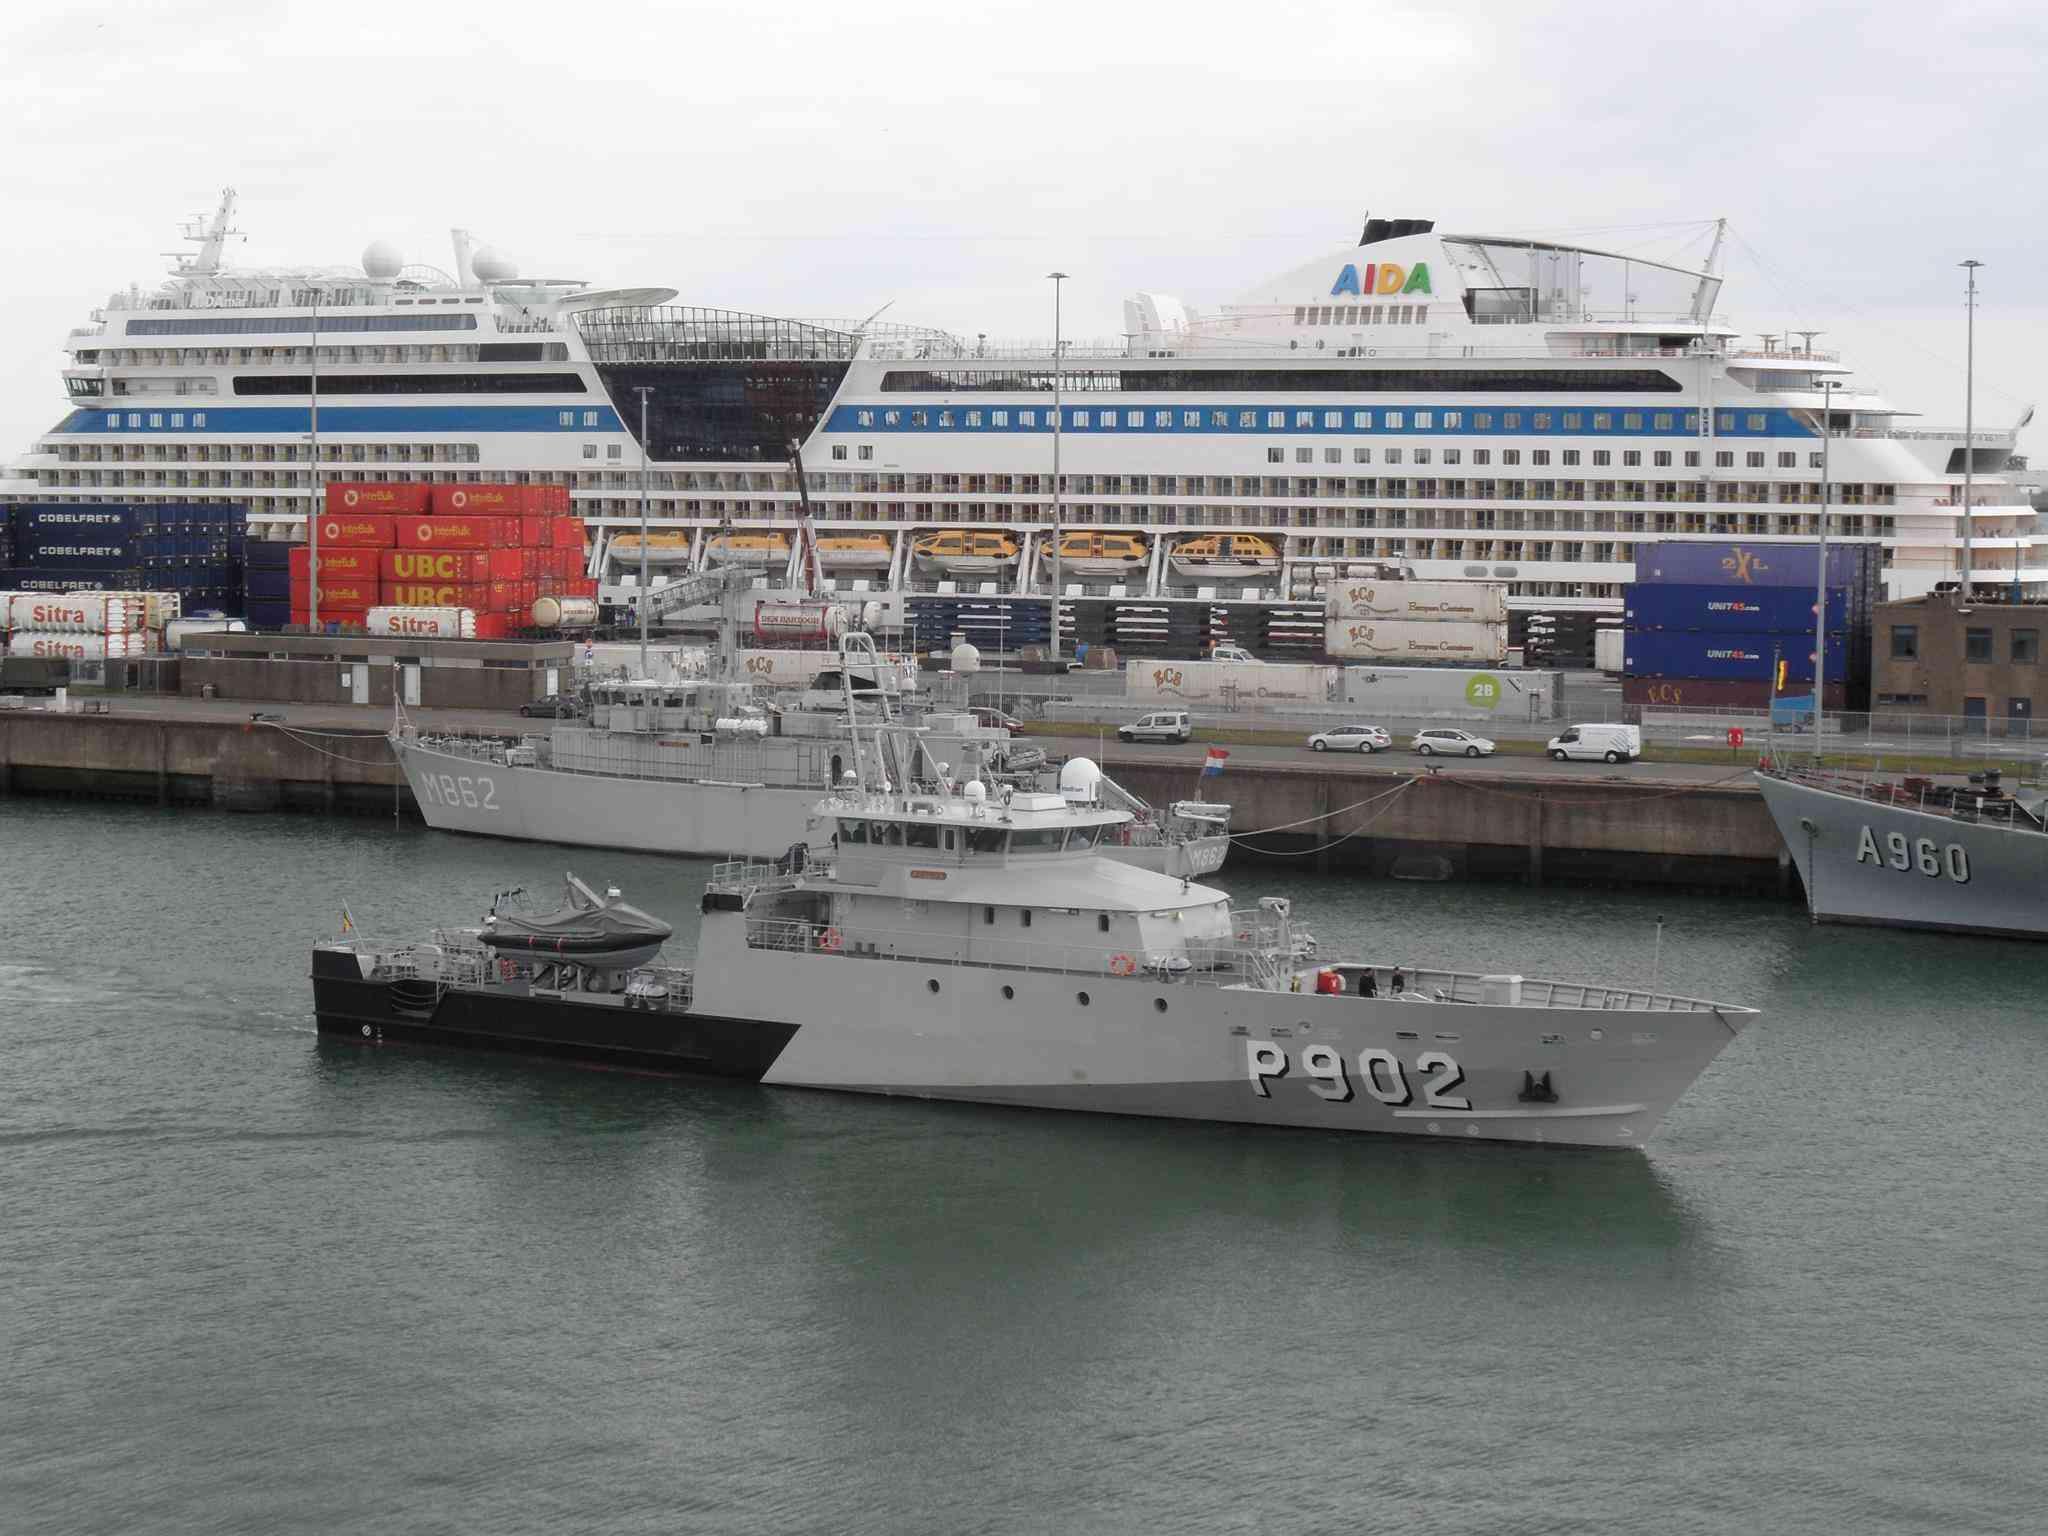 Arrivée du P902 POLLUX à Zeebrugge 10517210